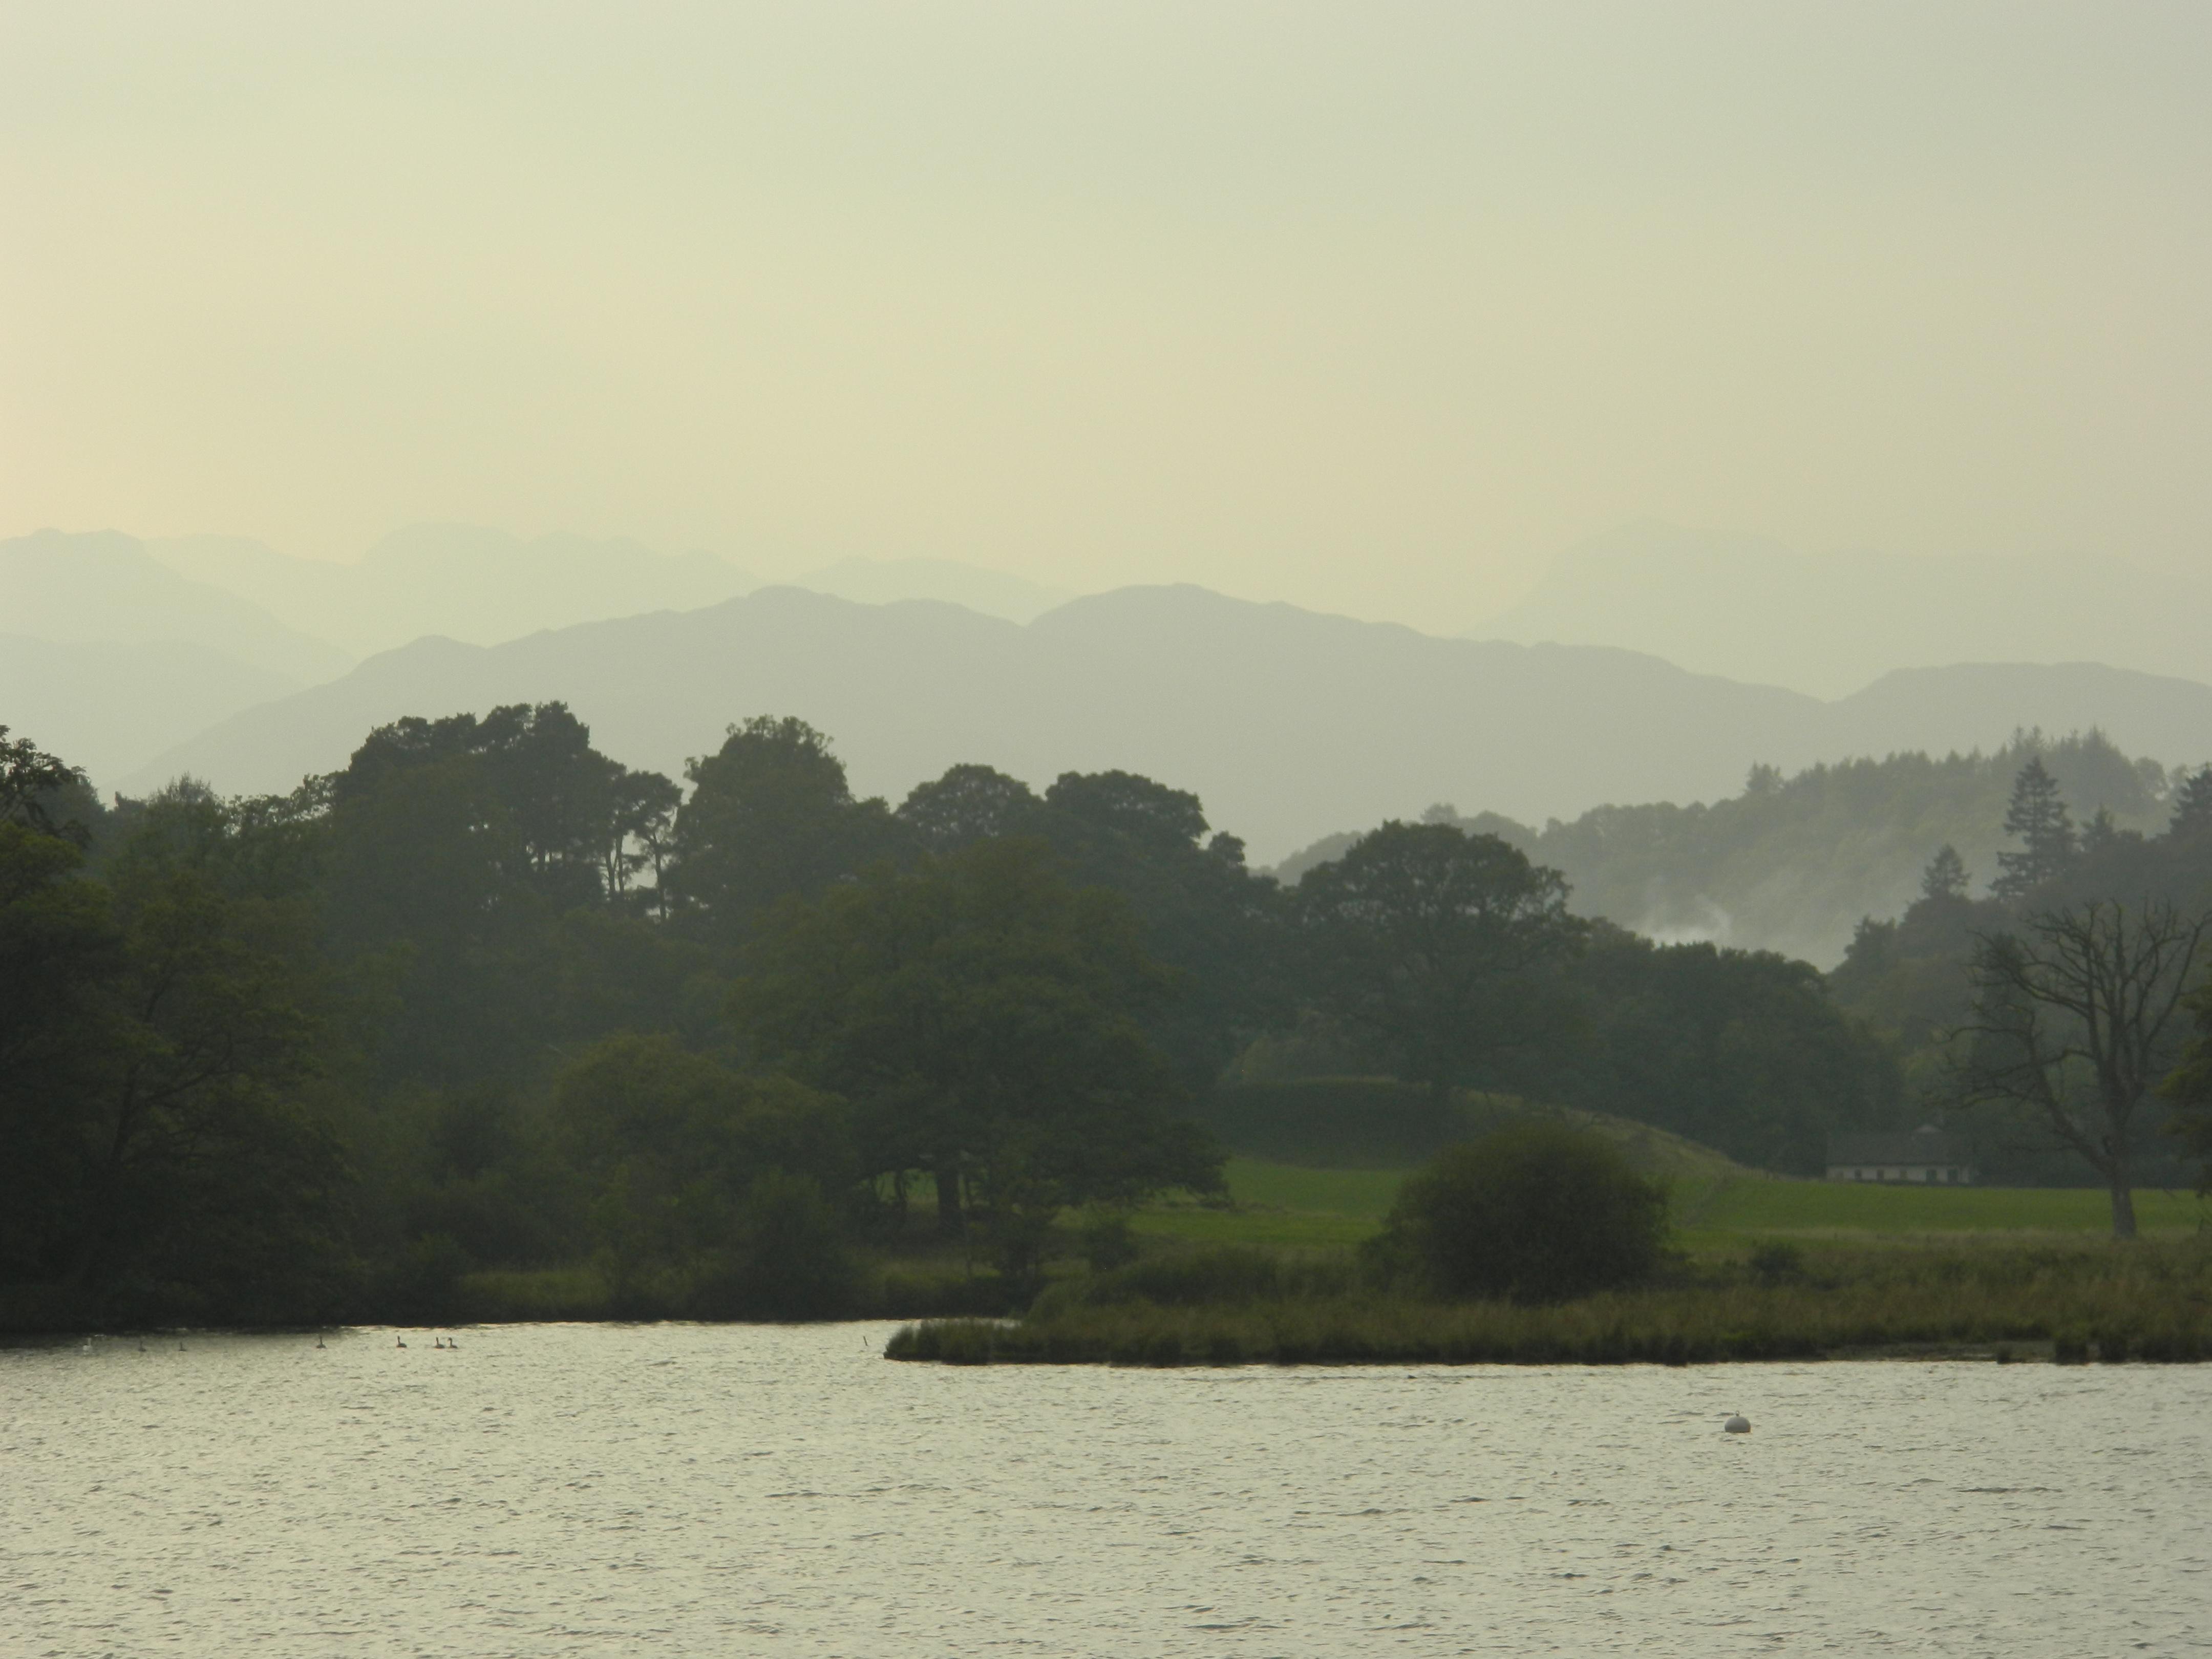 Mist Over Lake Windermere: Where The Wordsworths Walked